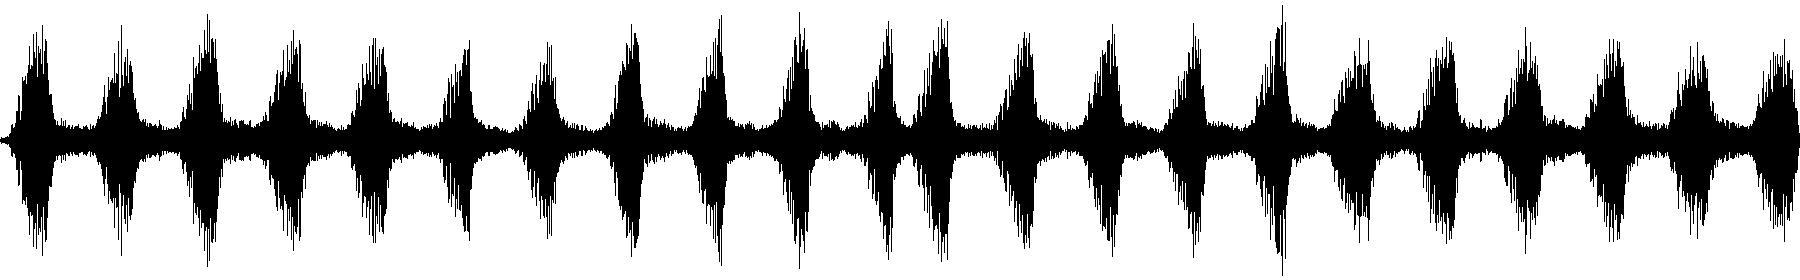 vedh melodyloop 084 fm7 9 cm7 9 gm7 9 dm7 9 120bpm